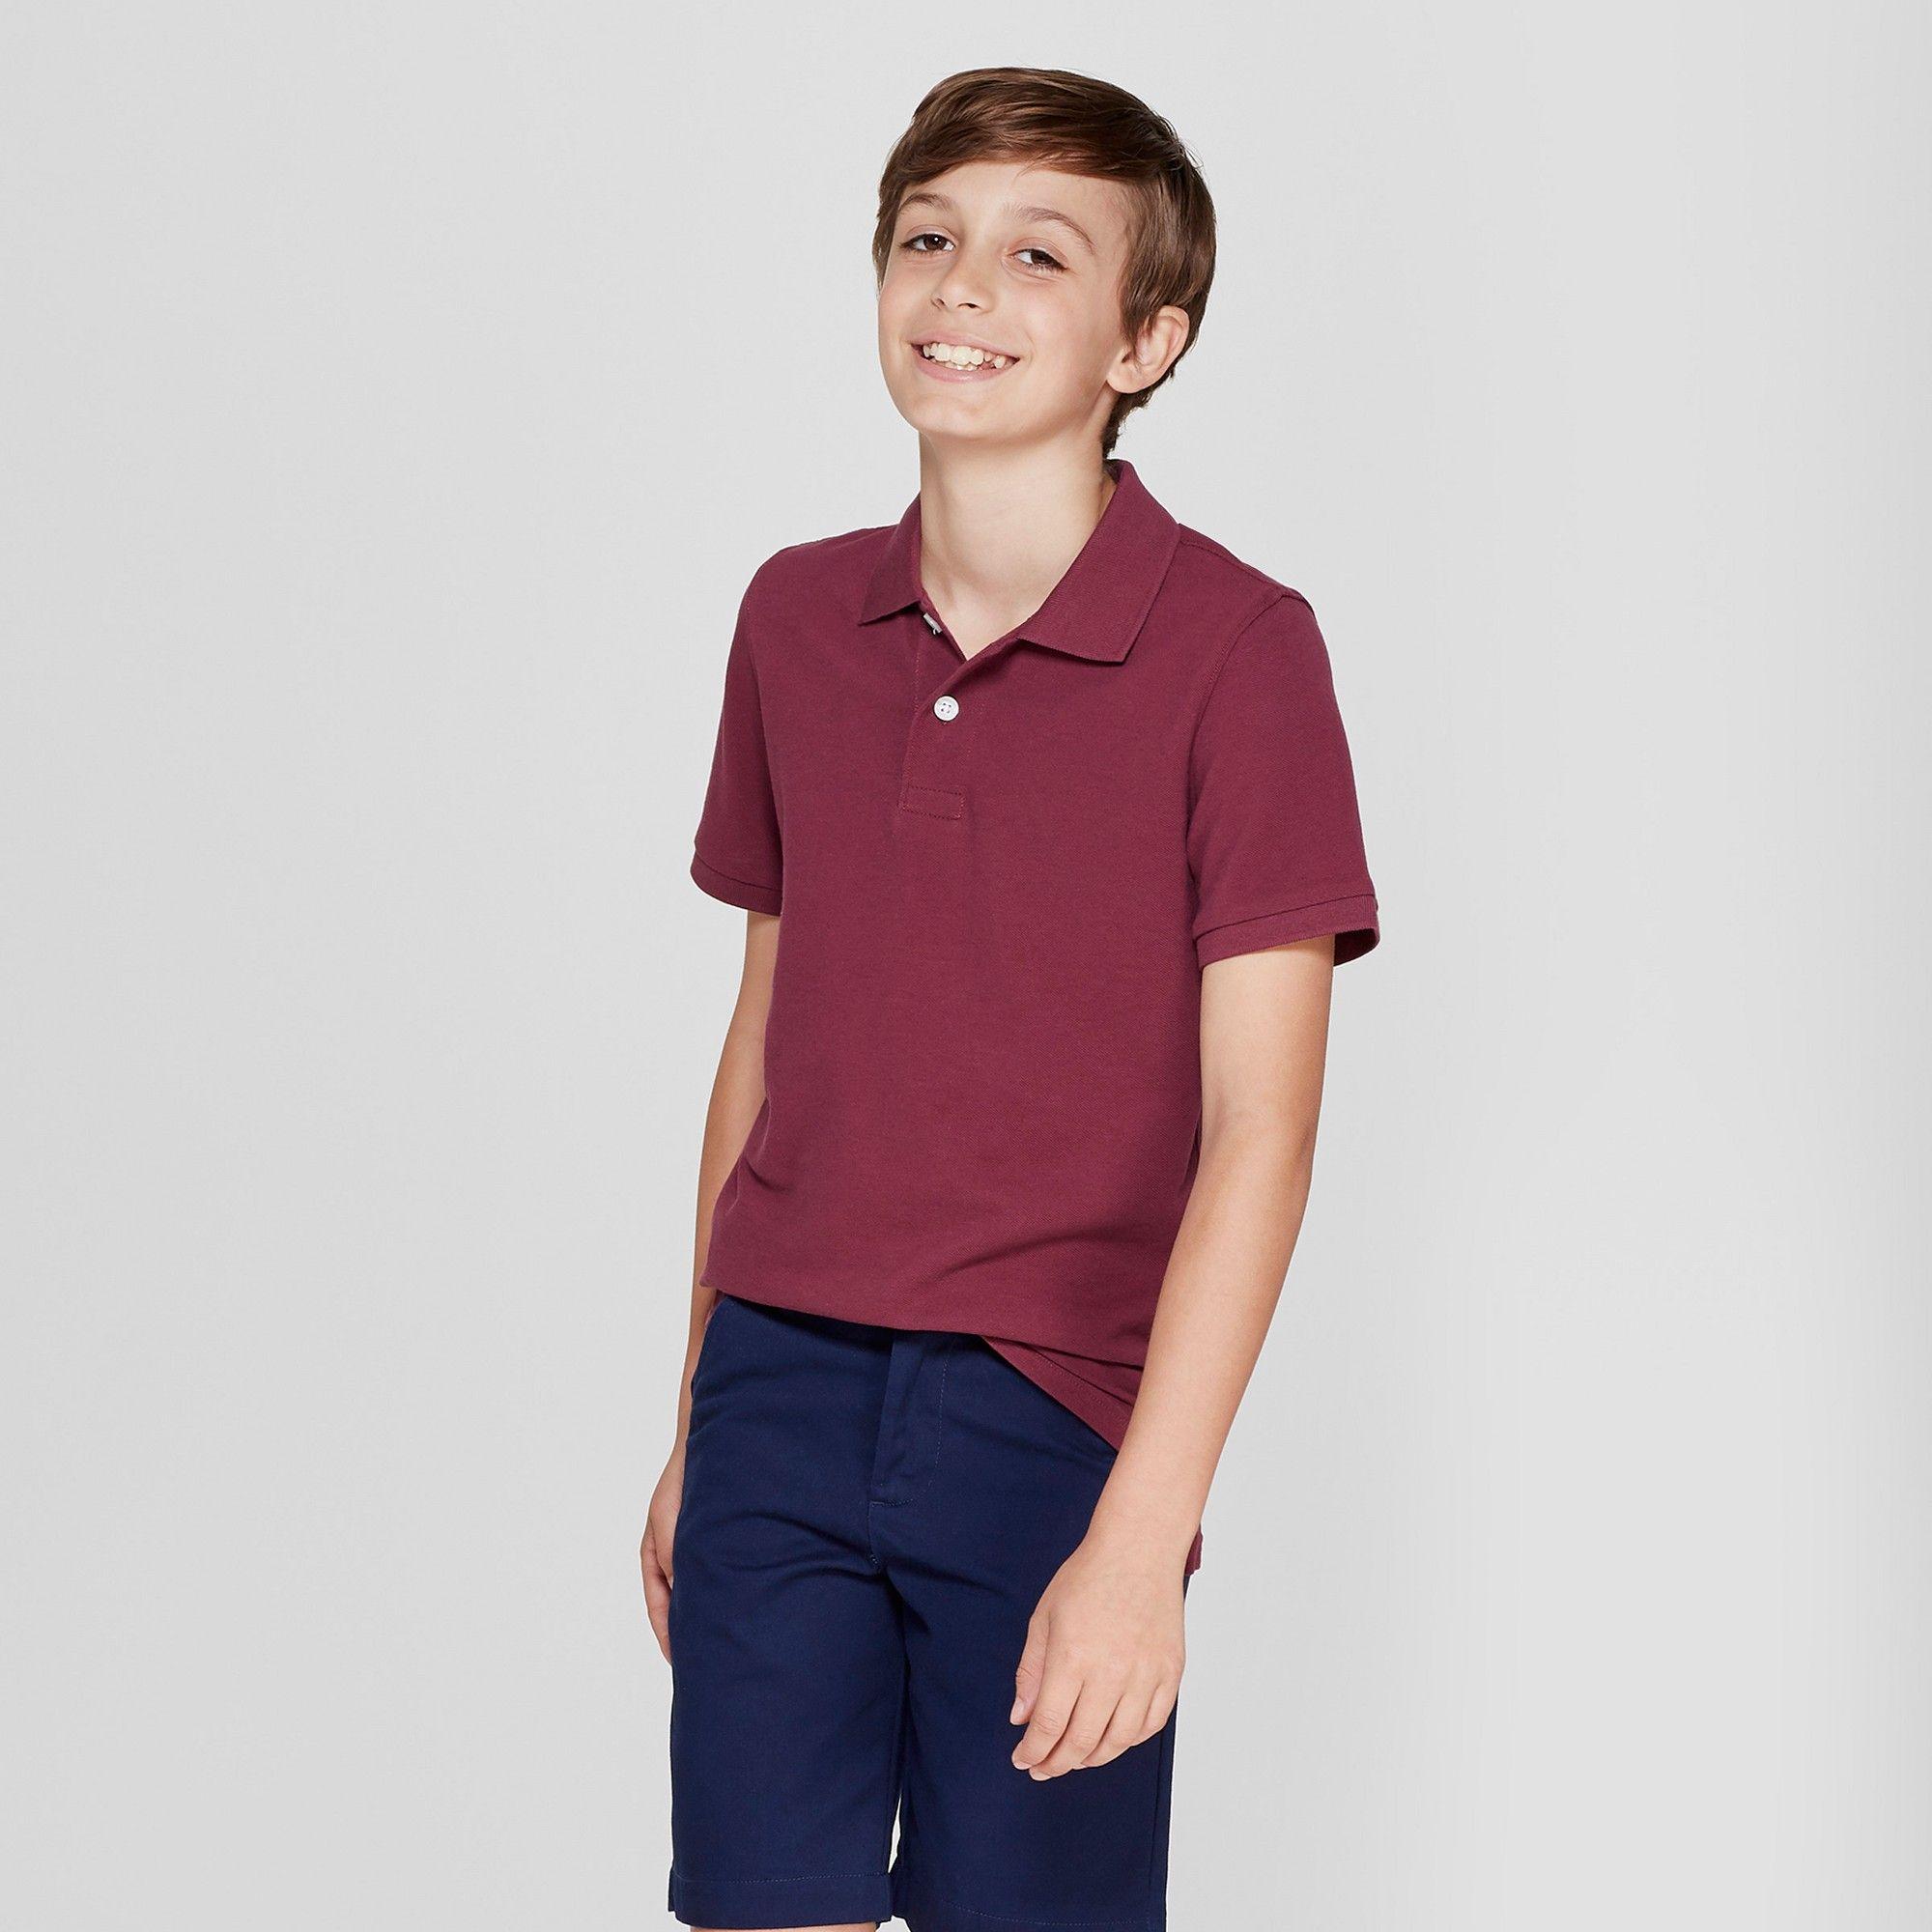 5cdabff15 Boys' Short Sleeve Pique Uniform Polo Shirt - Cat & Jack Burgundy (Red) Xxl